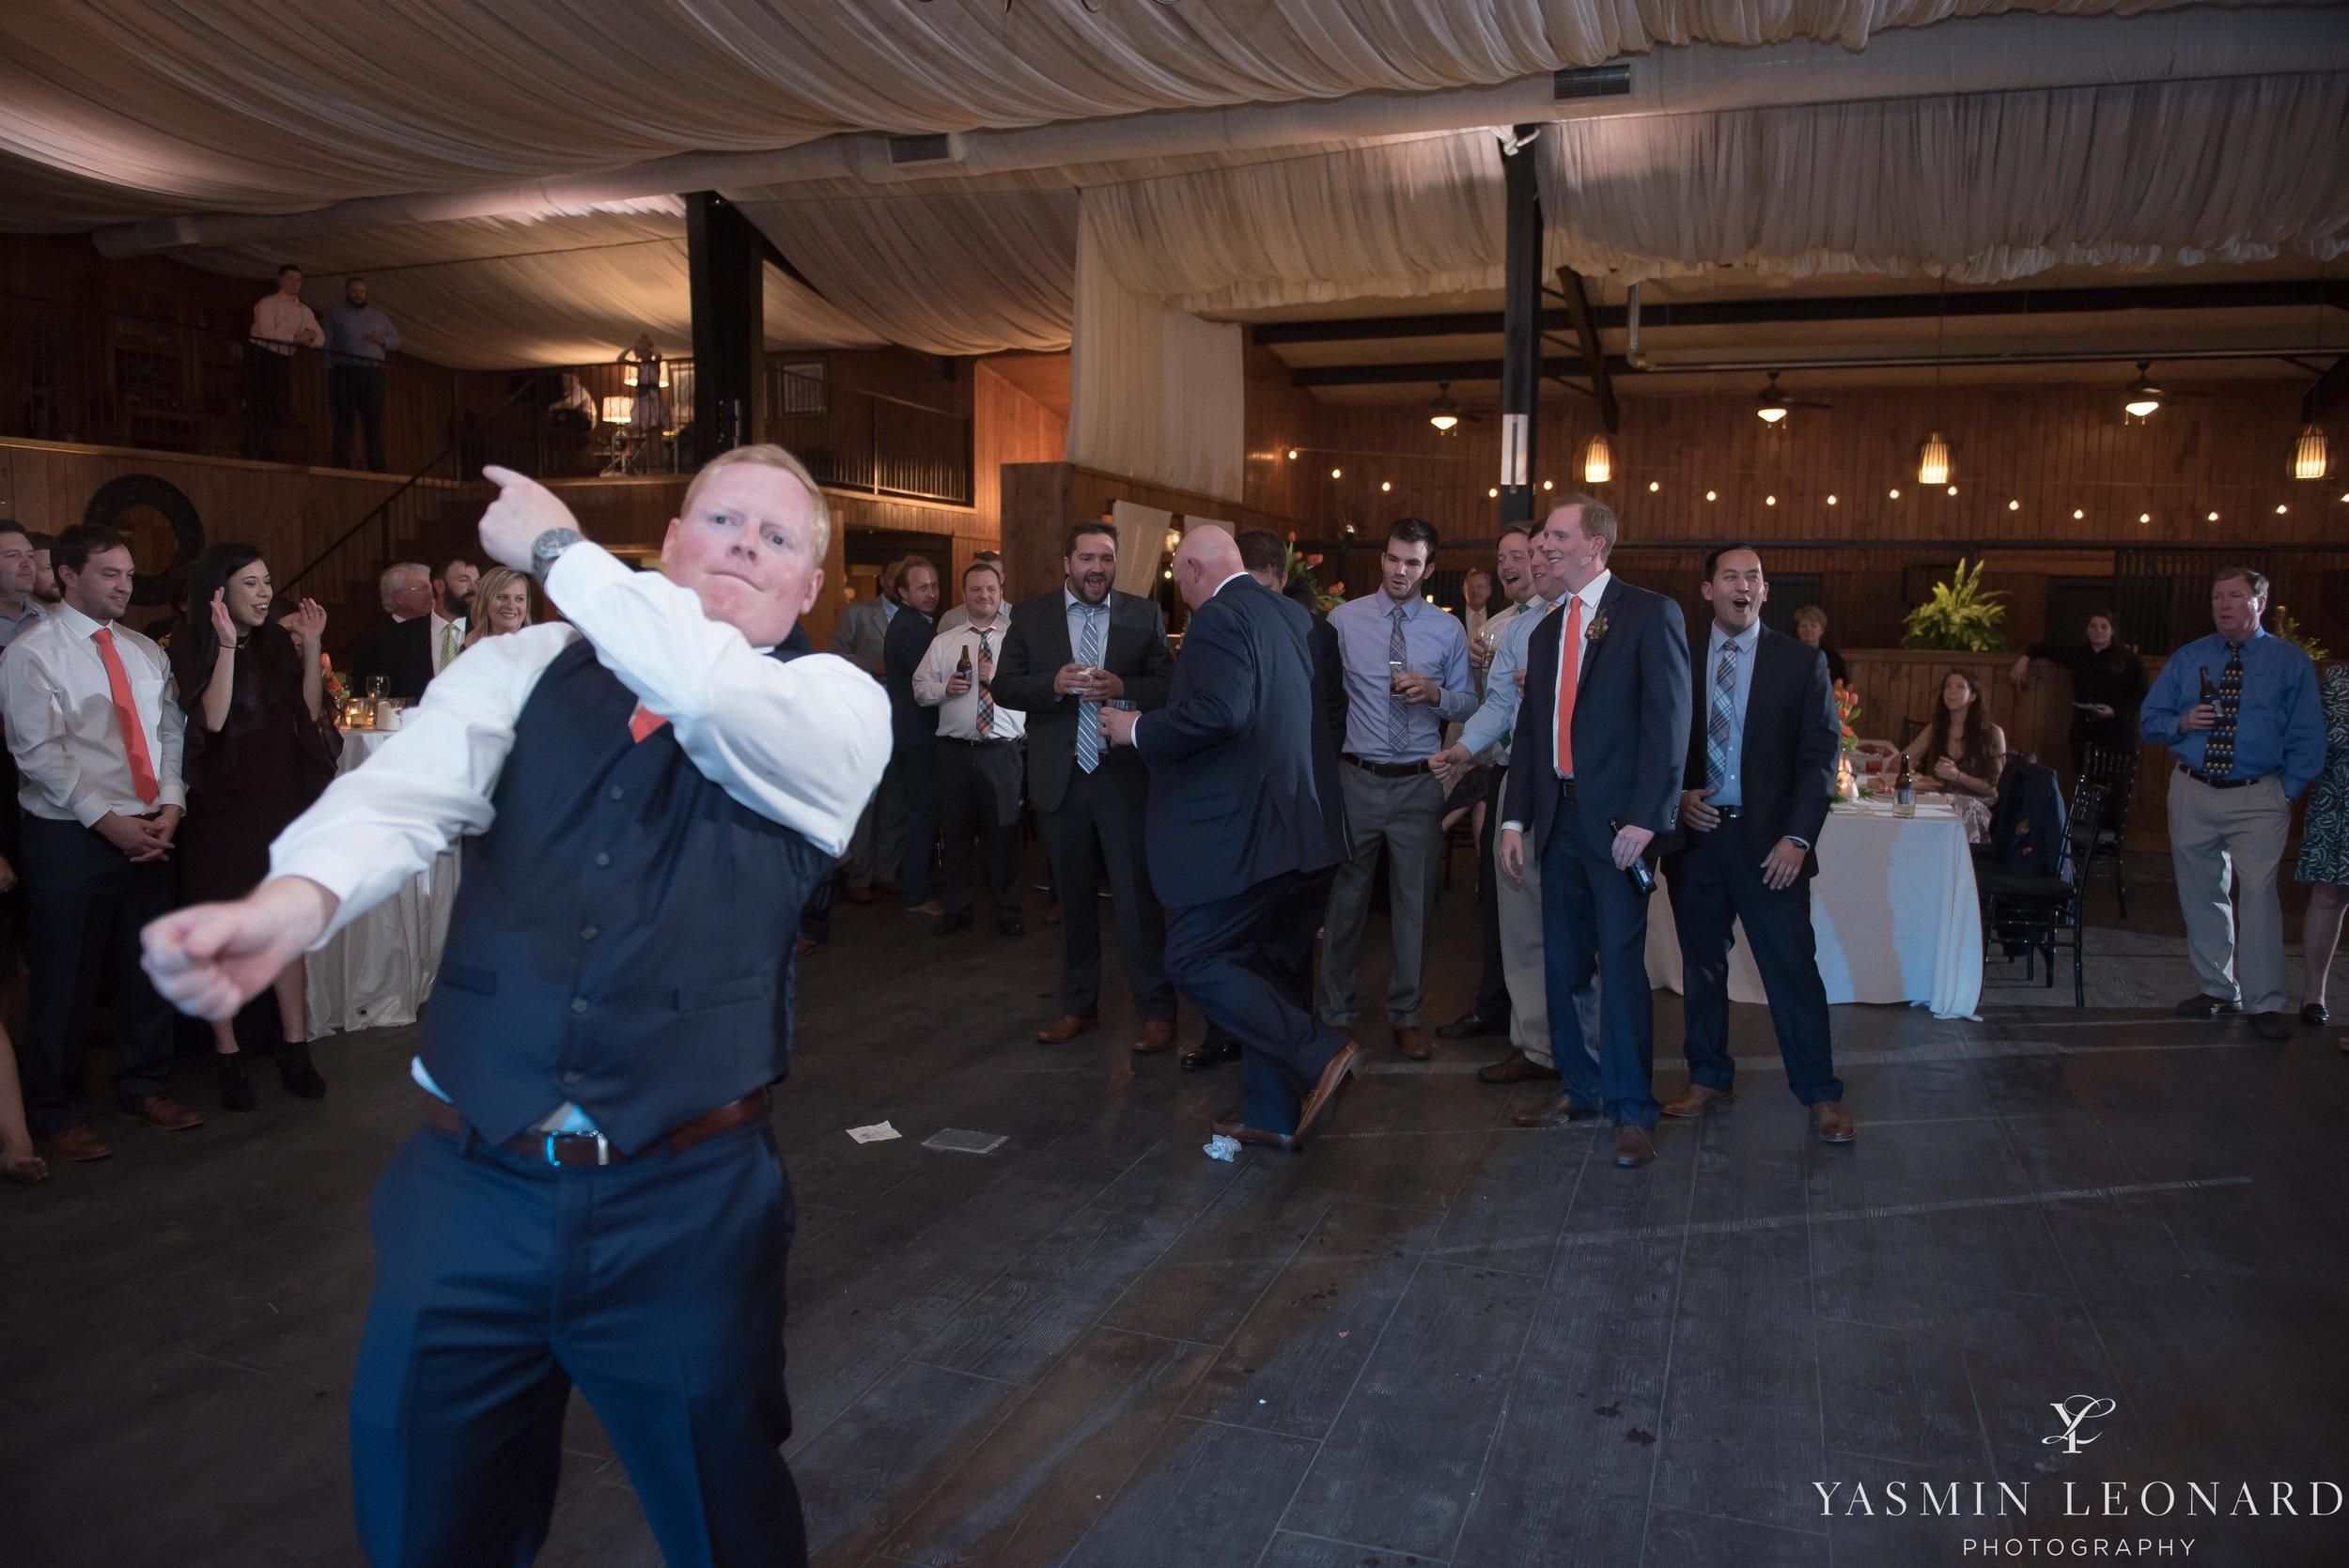 Adaumont Farm - Adaumont Farm Weddings - Trinity Weddings - NC Weddings - Yasmin Leonard Photography-98.jpg